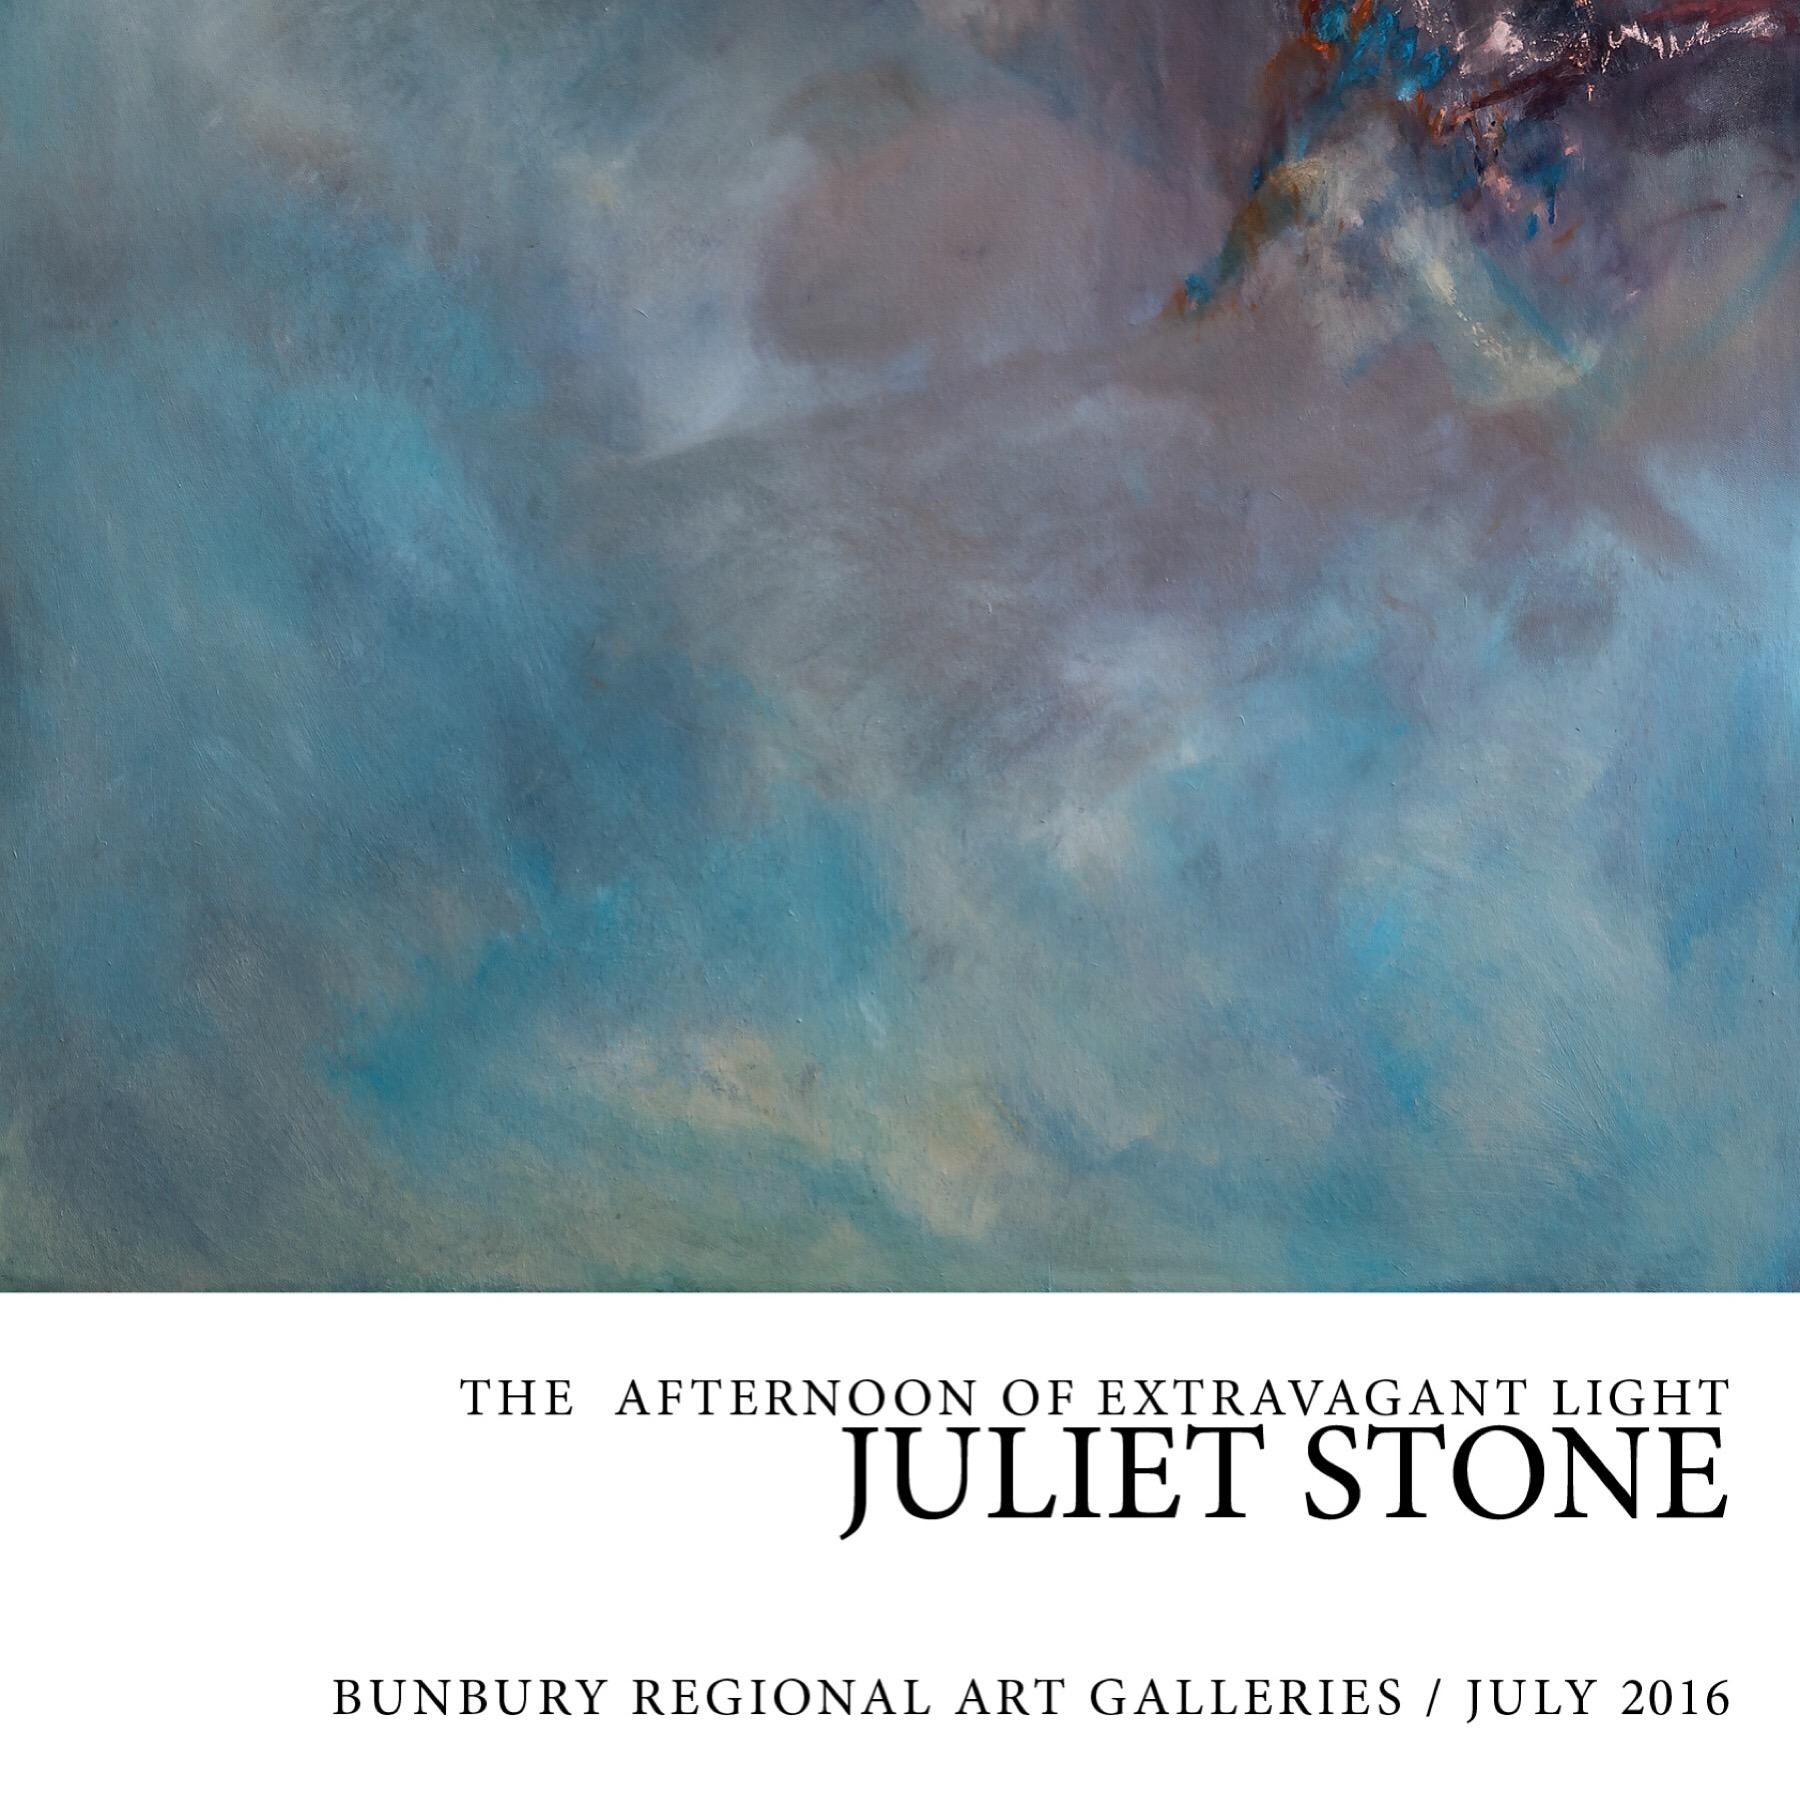 bunbury regional art galleries | juliet stone catalogue